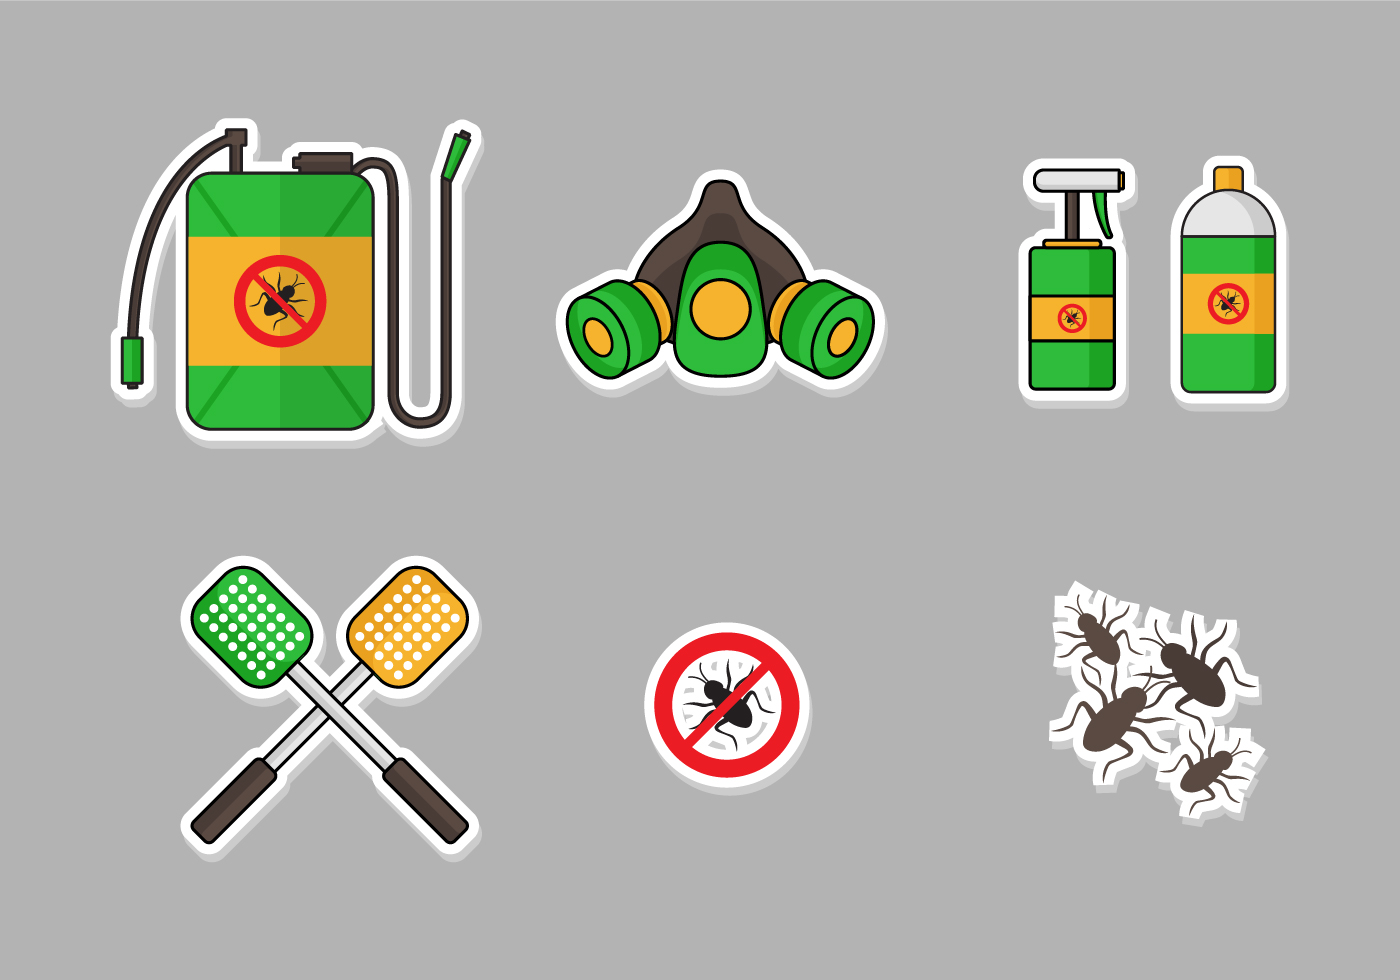 pest-control-icon-set-vector.jpg